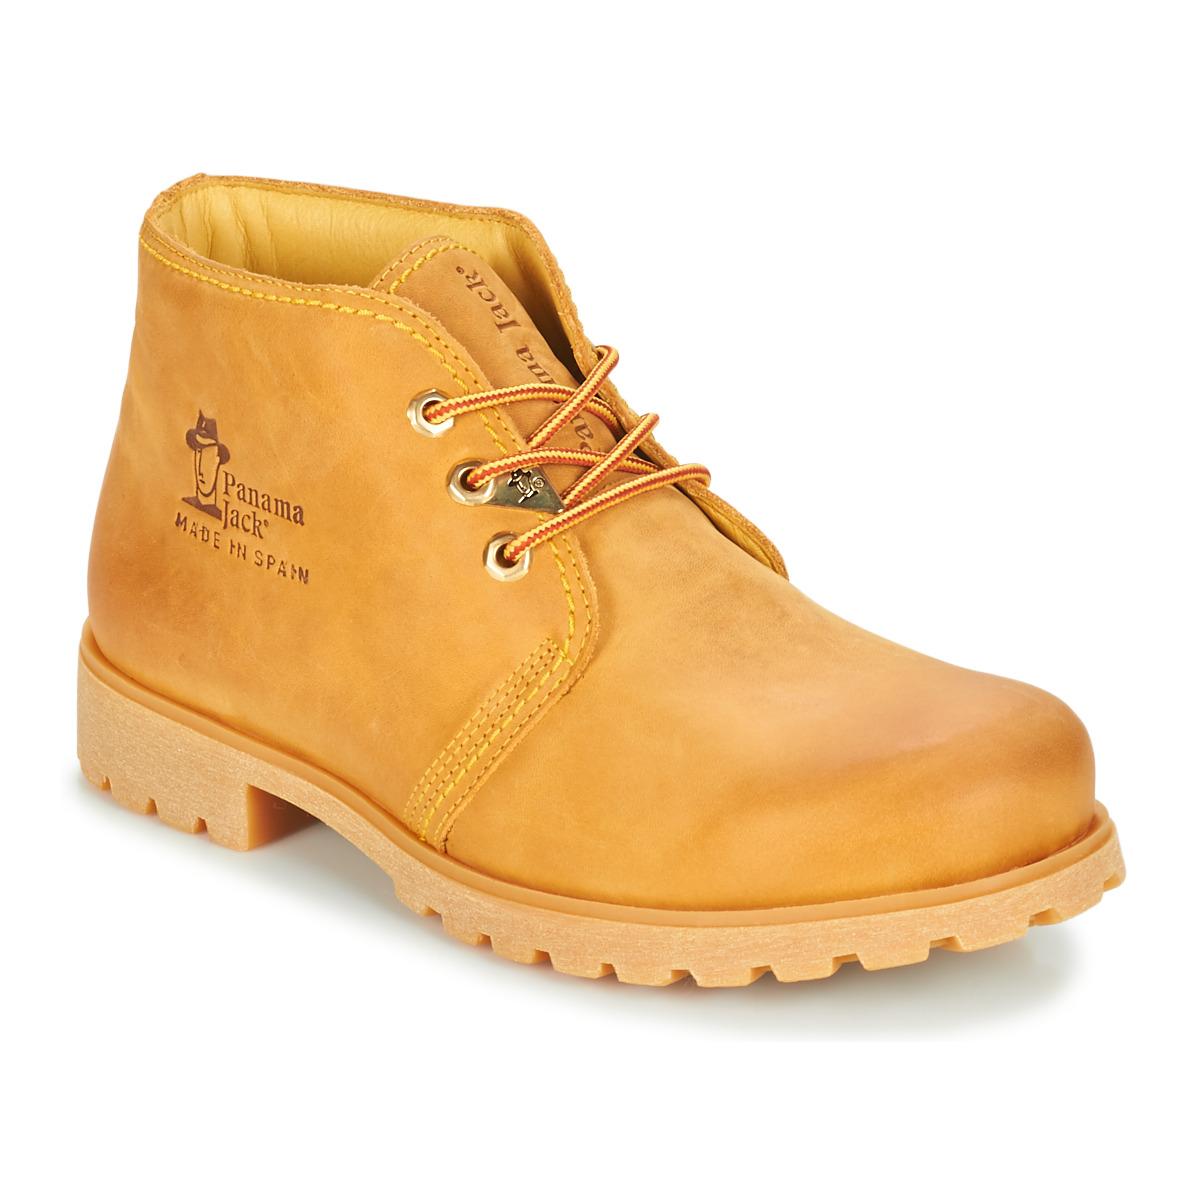 Panama Jack BOTA PANAMA Beige - Kostenloser Versand bei Spartoode ! - Schuhe Boots Herren 134,10 €